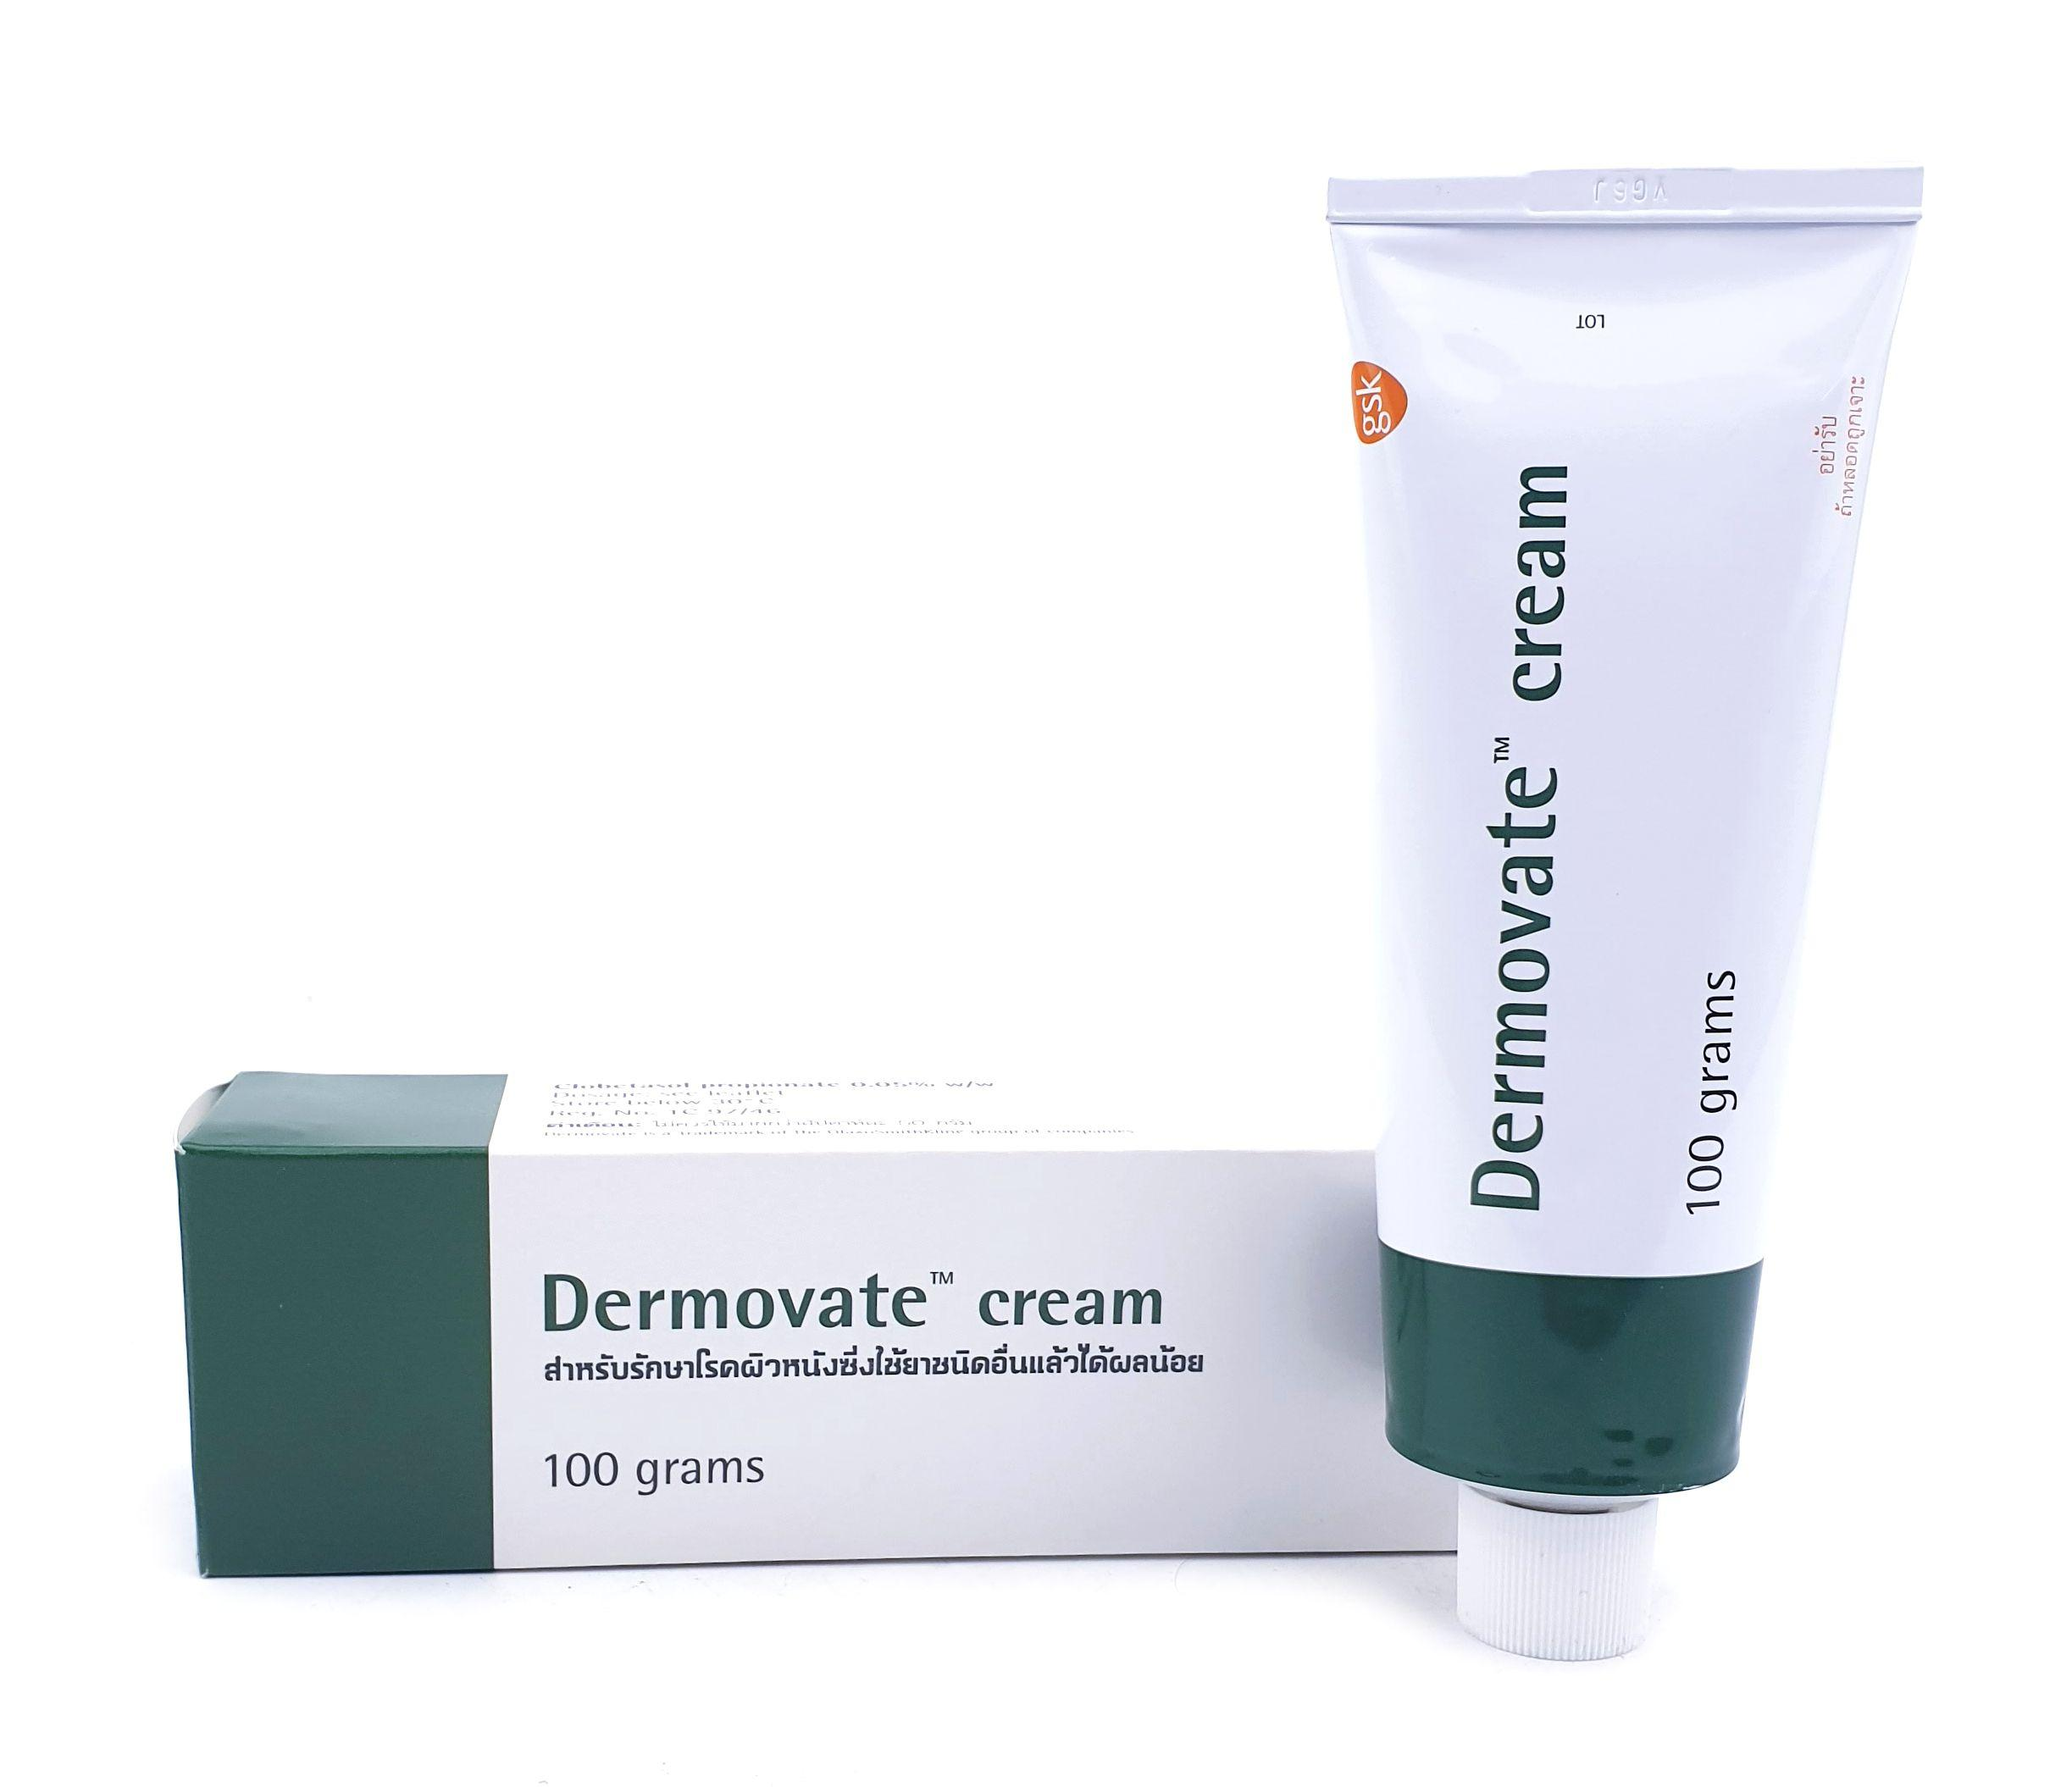 DERMOVATE Cream Clobetasol Propionate 100g